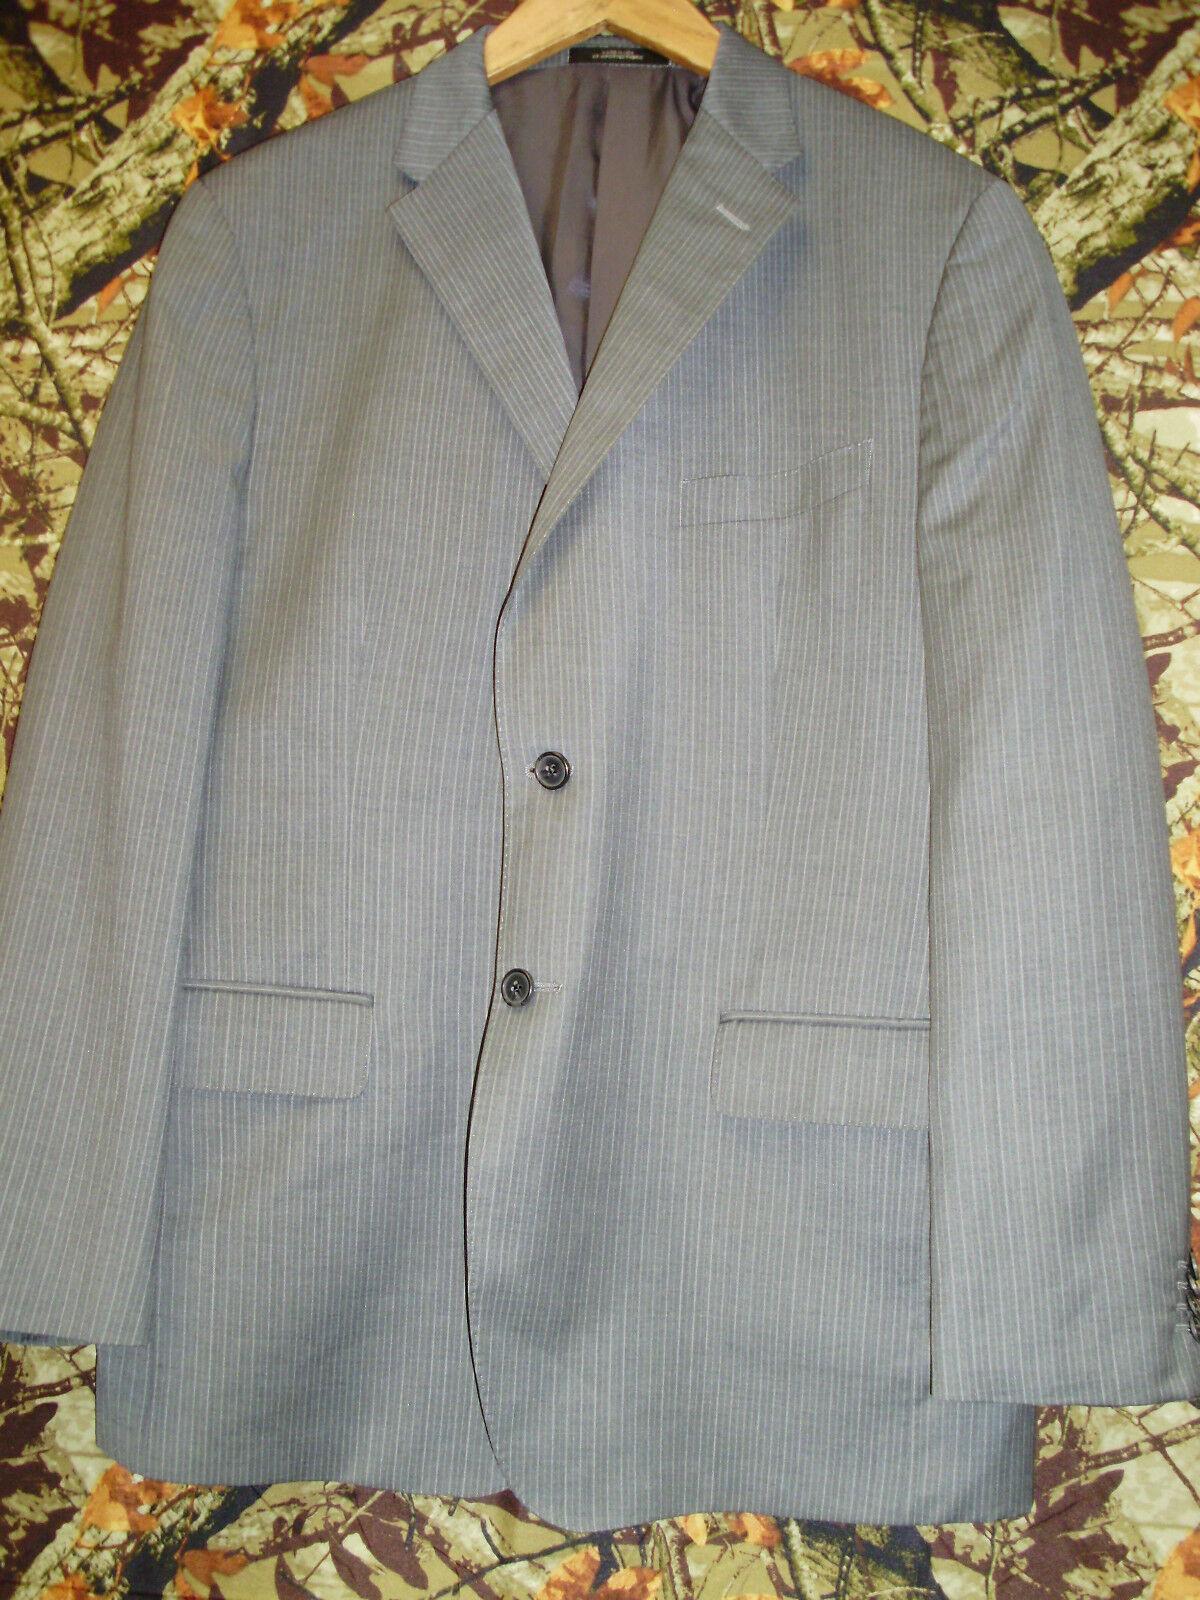 Recent Ermenegildo Zegna grau Pinstripe Wool Silk Blend 2 Button Sport Coat 44R